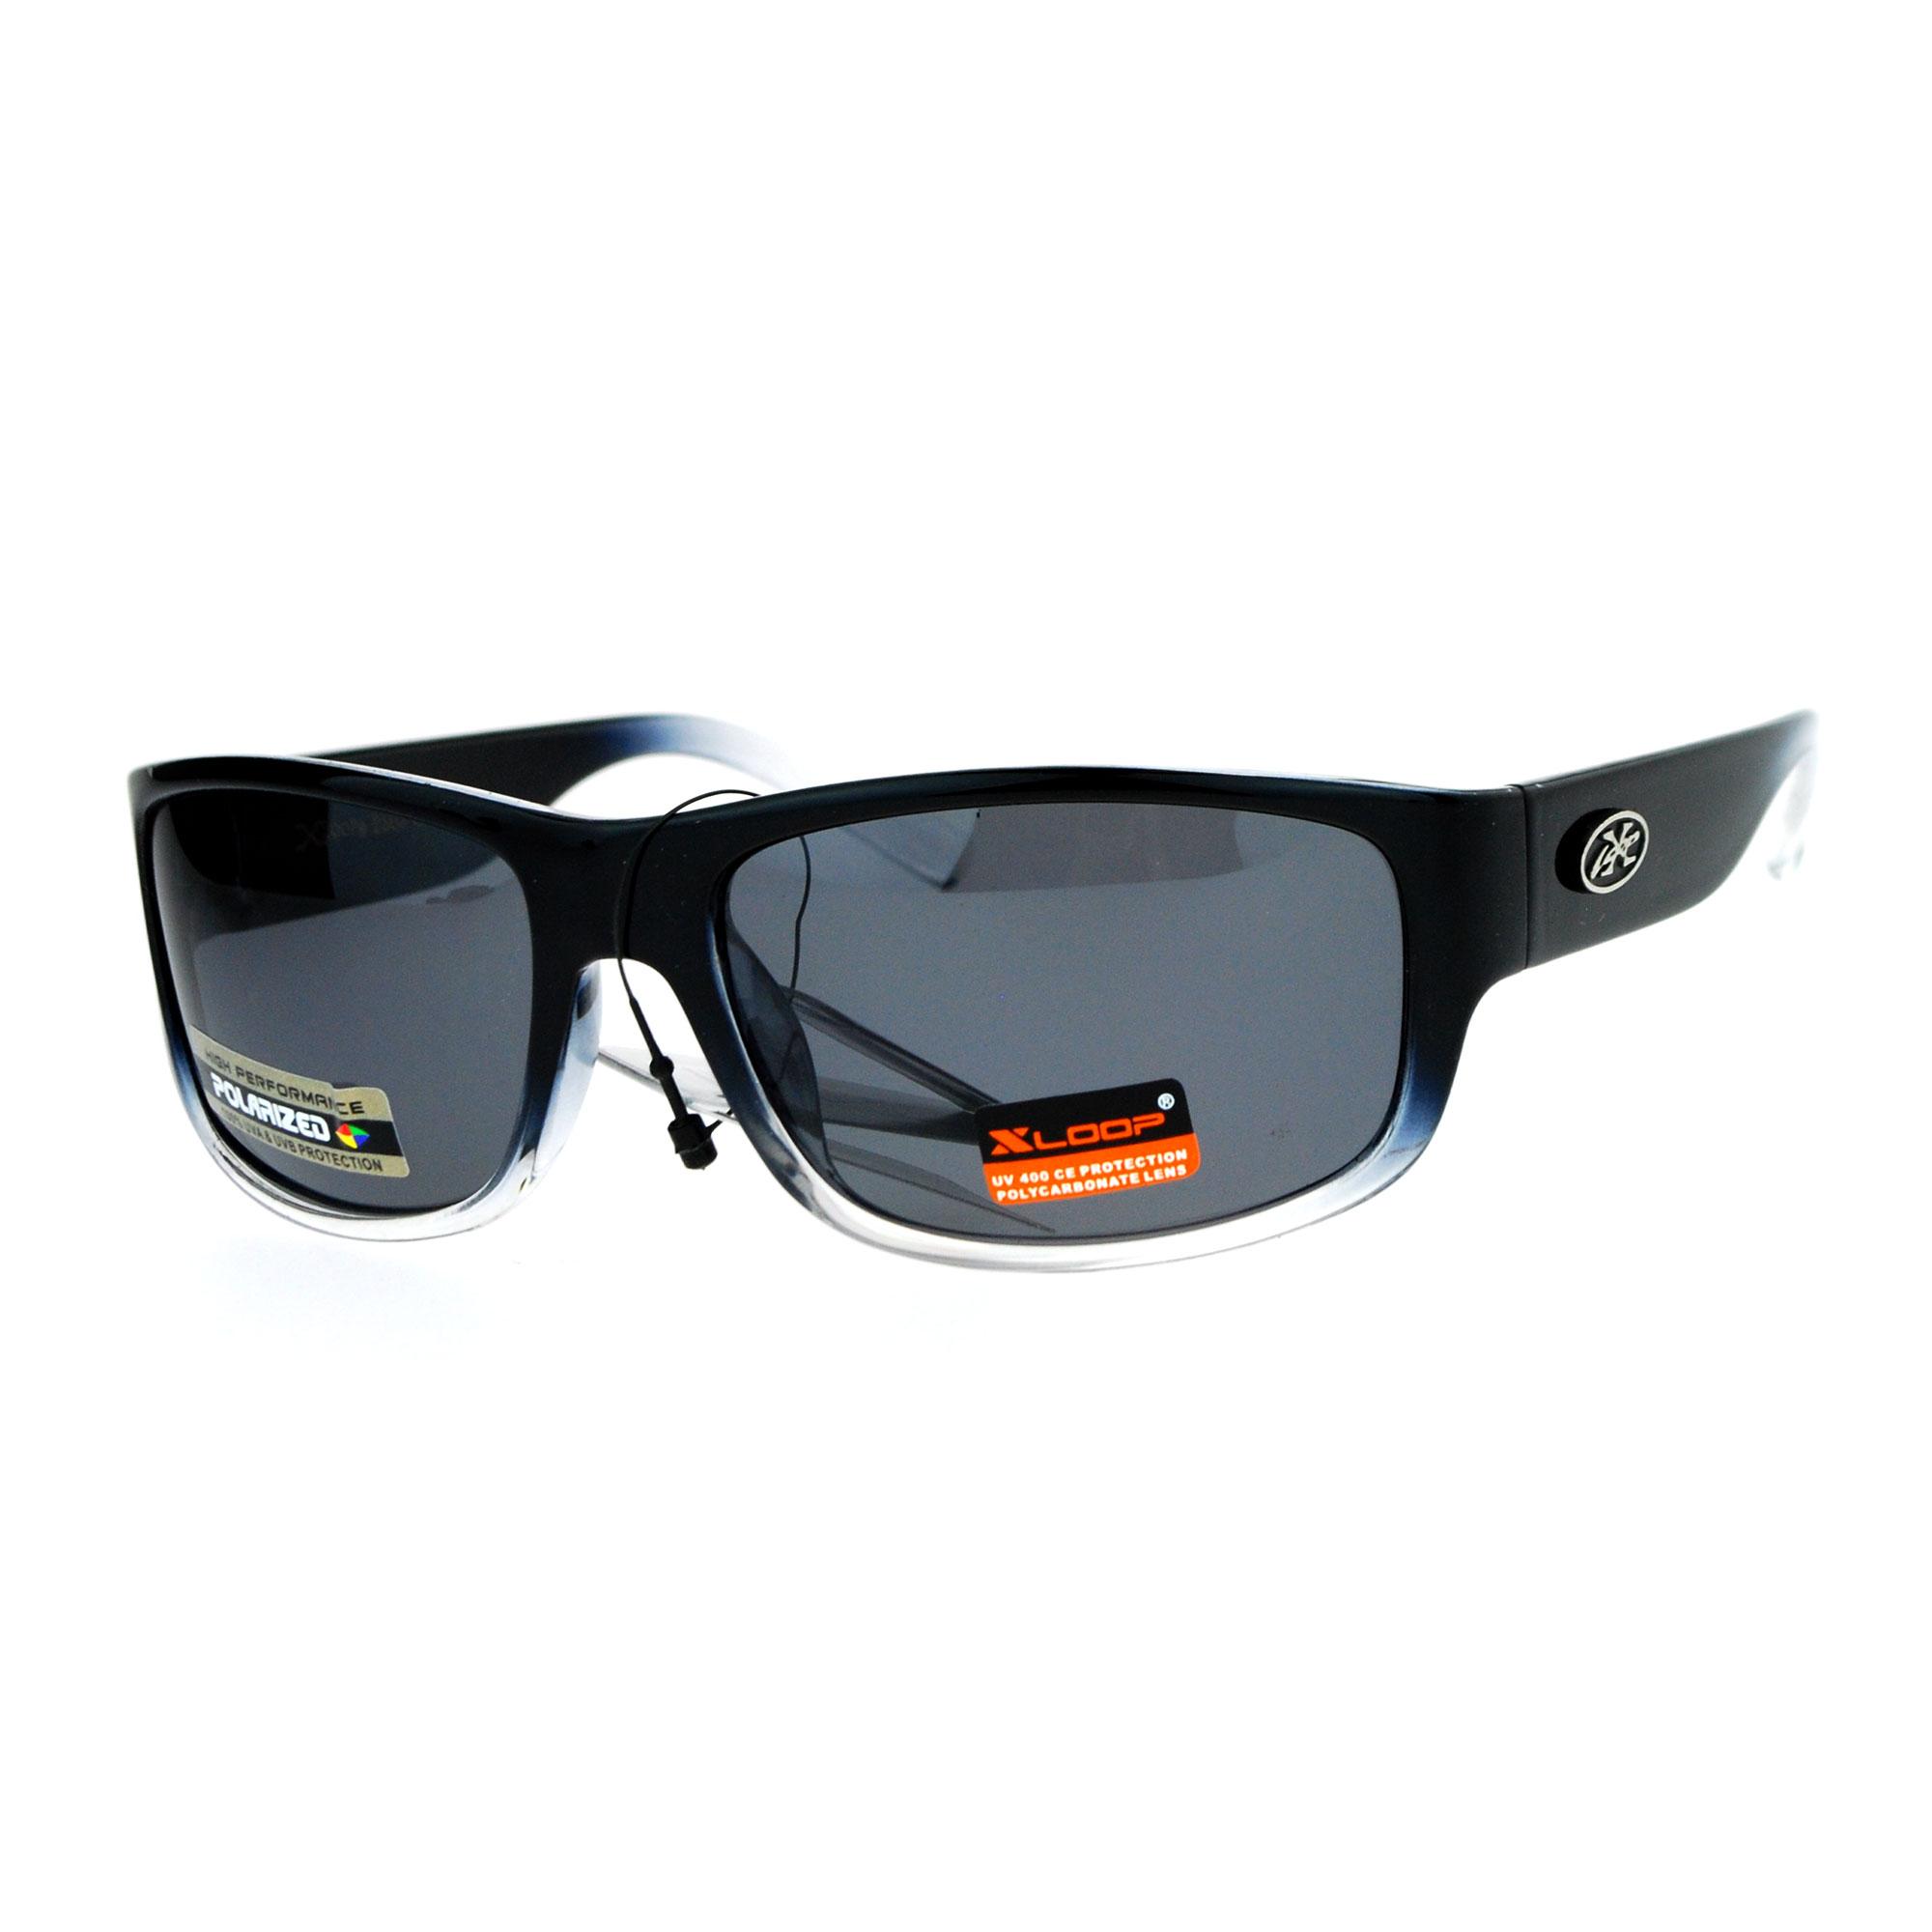 a1ebcf58e2 Polarized Fishing Sunglasses For Men